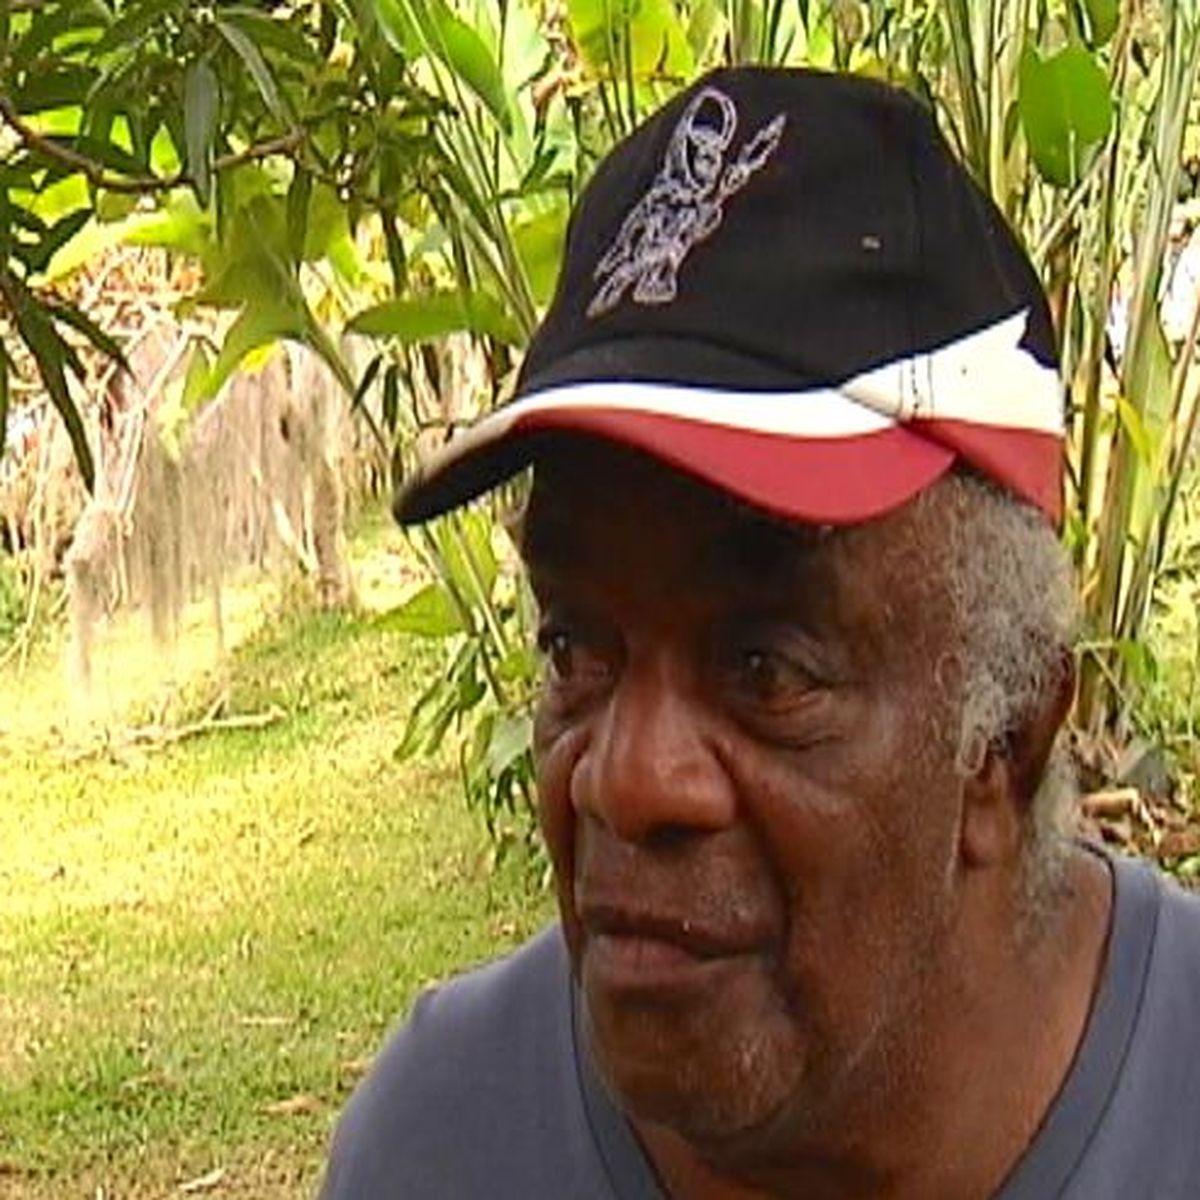 Disparition d'Edmond Kawa, ancien élu de Sarraméa